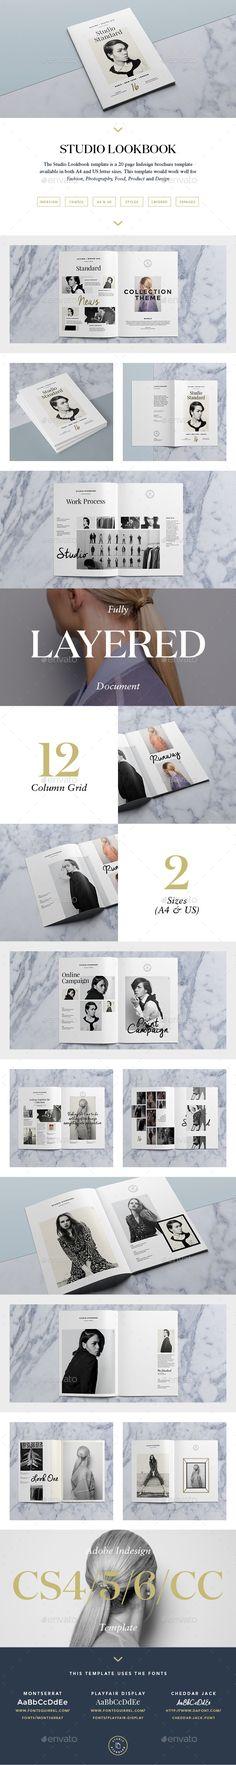 Studio Lookbook Template #design Download: http://graphicriver.net/item/studio-lookbook/10186162?ref=ksioks